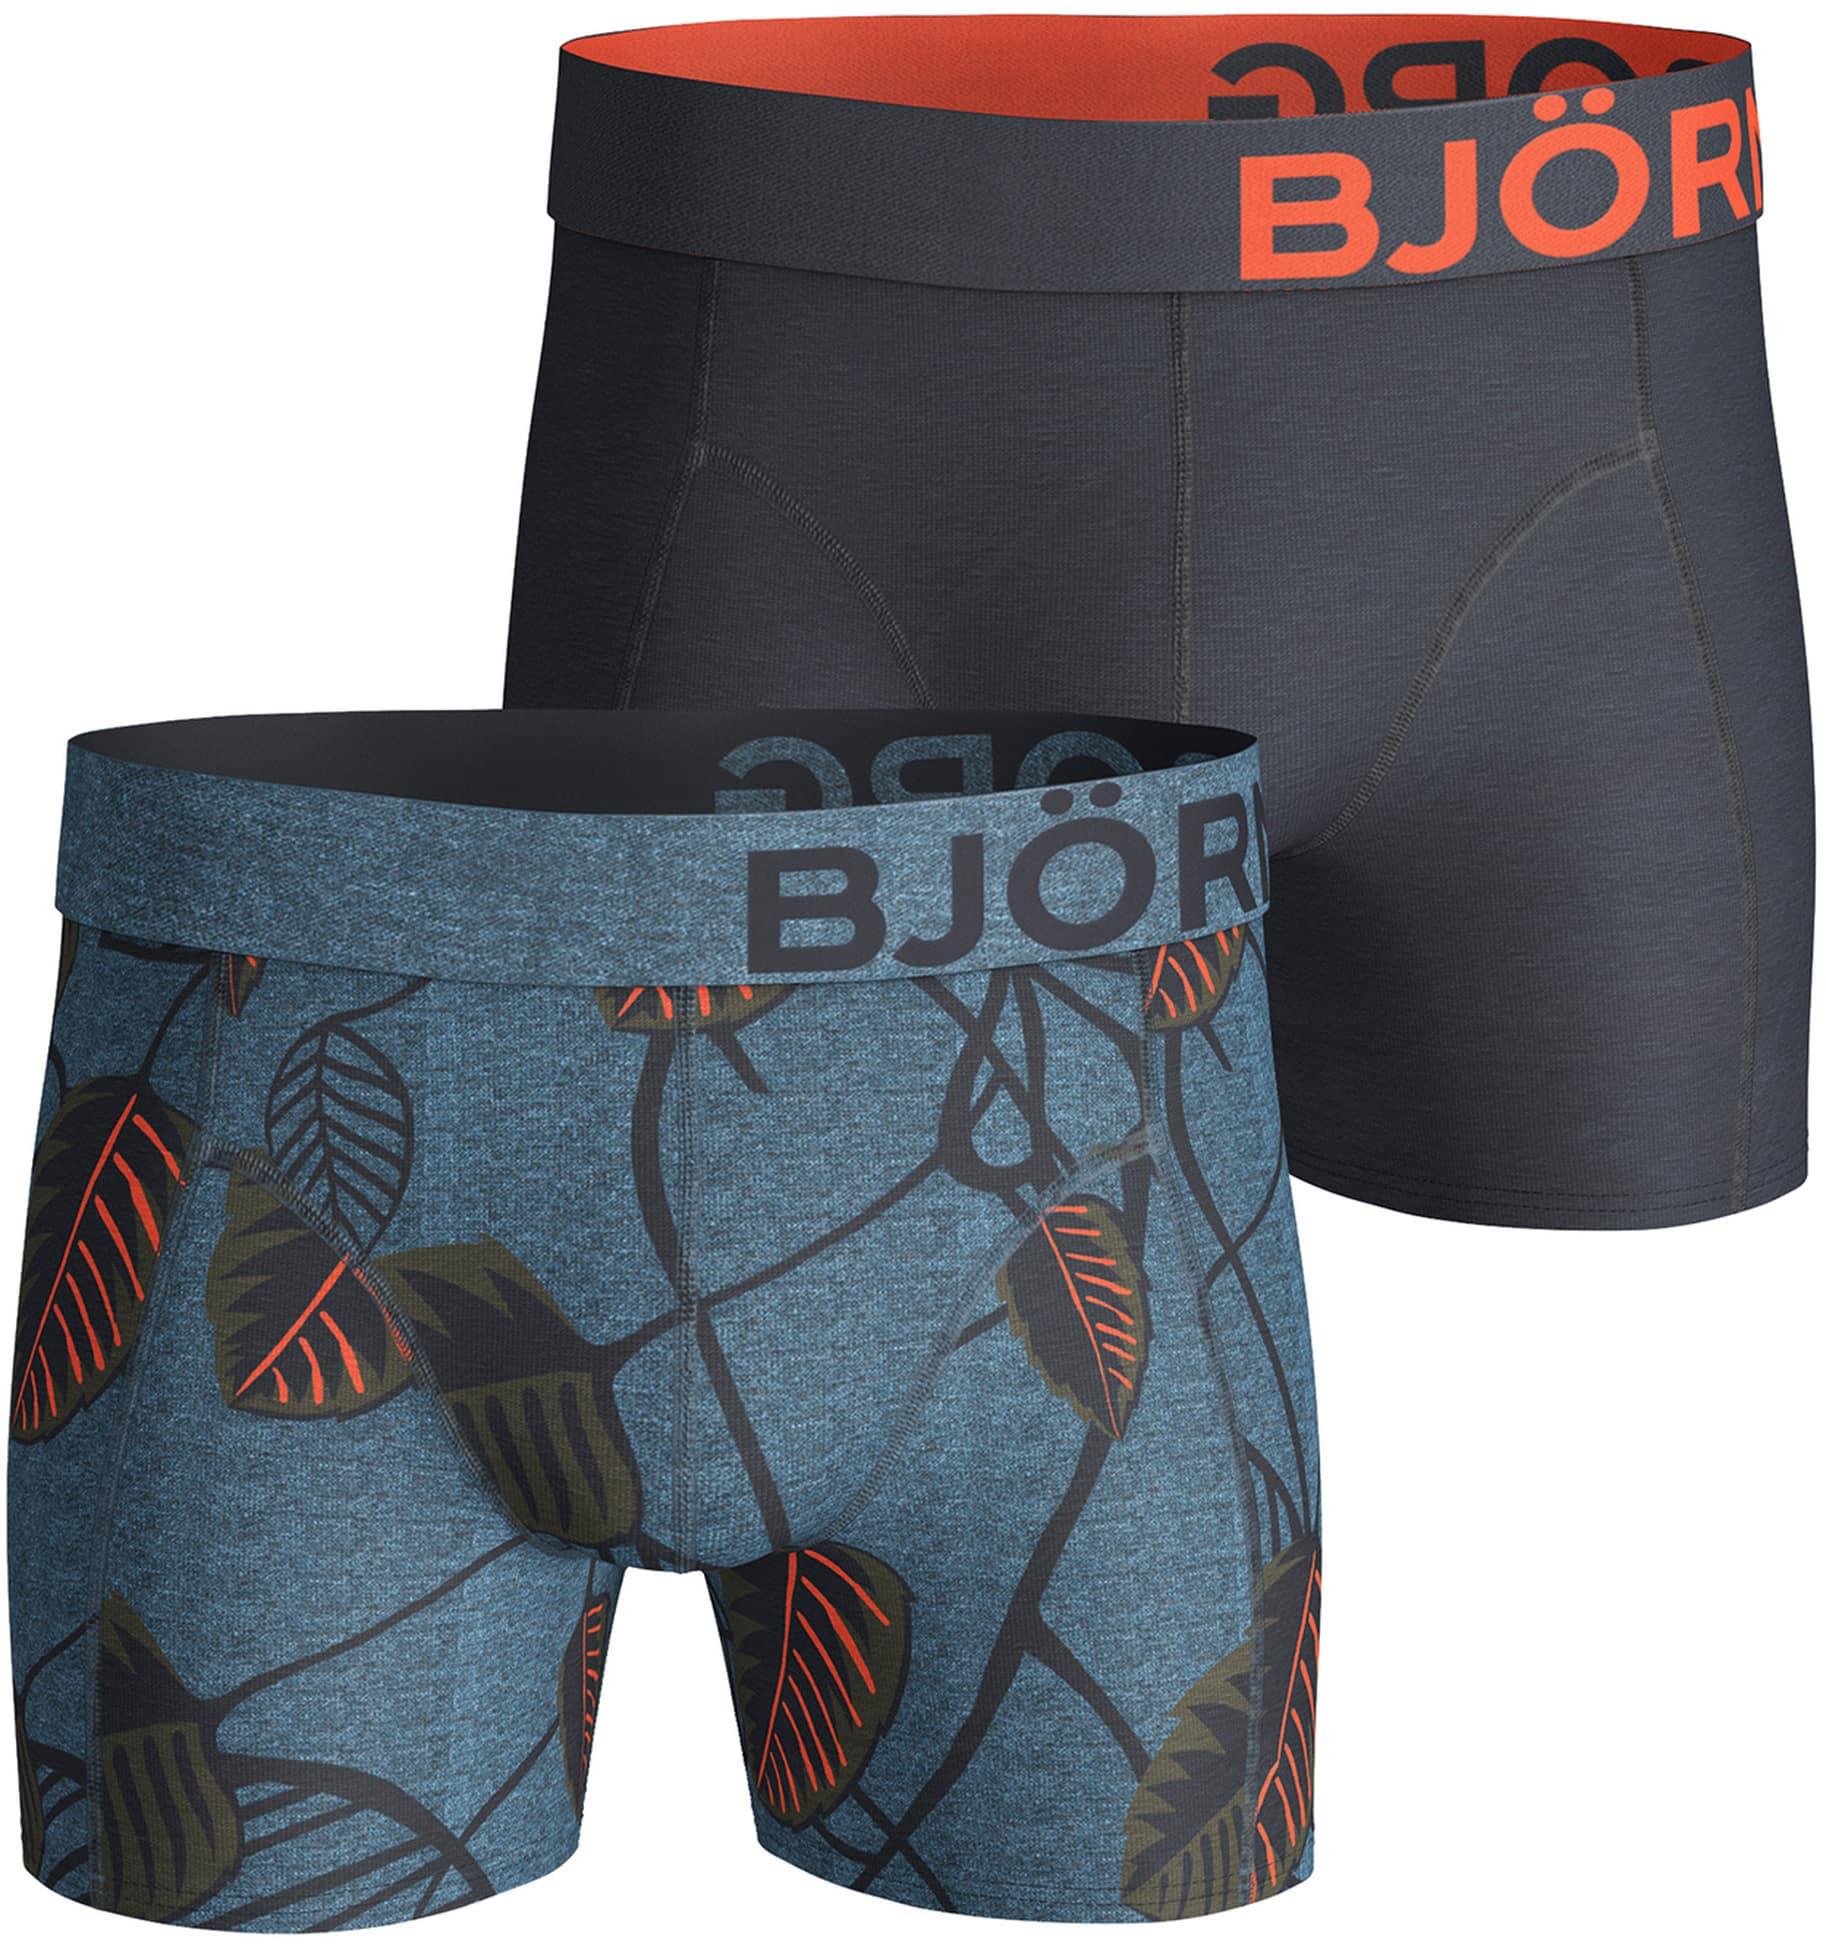 bjorn borg 2 pack boxers online bestellen suitable. Black Bedroom Furniture Sets. Home Design Ideas